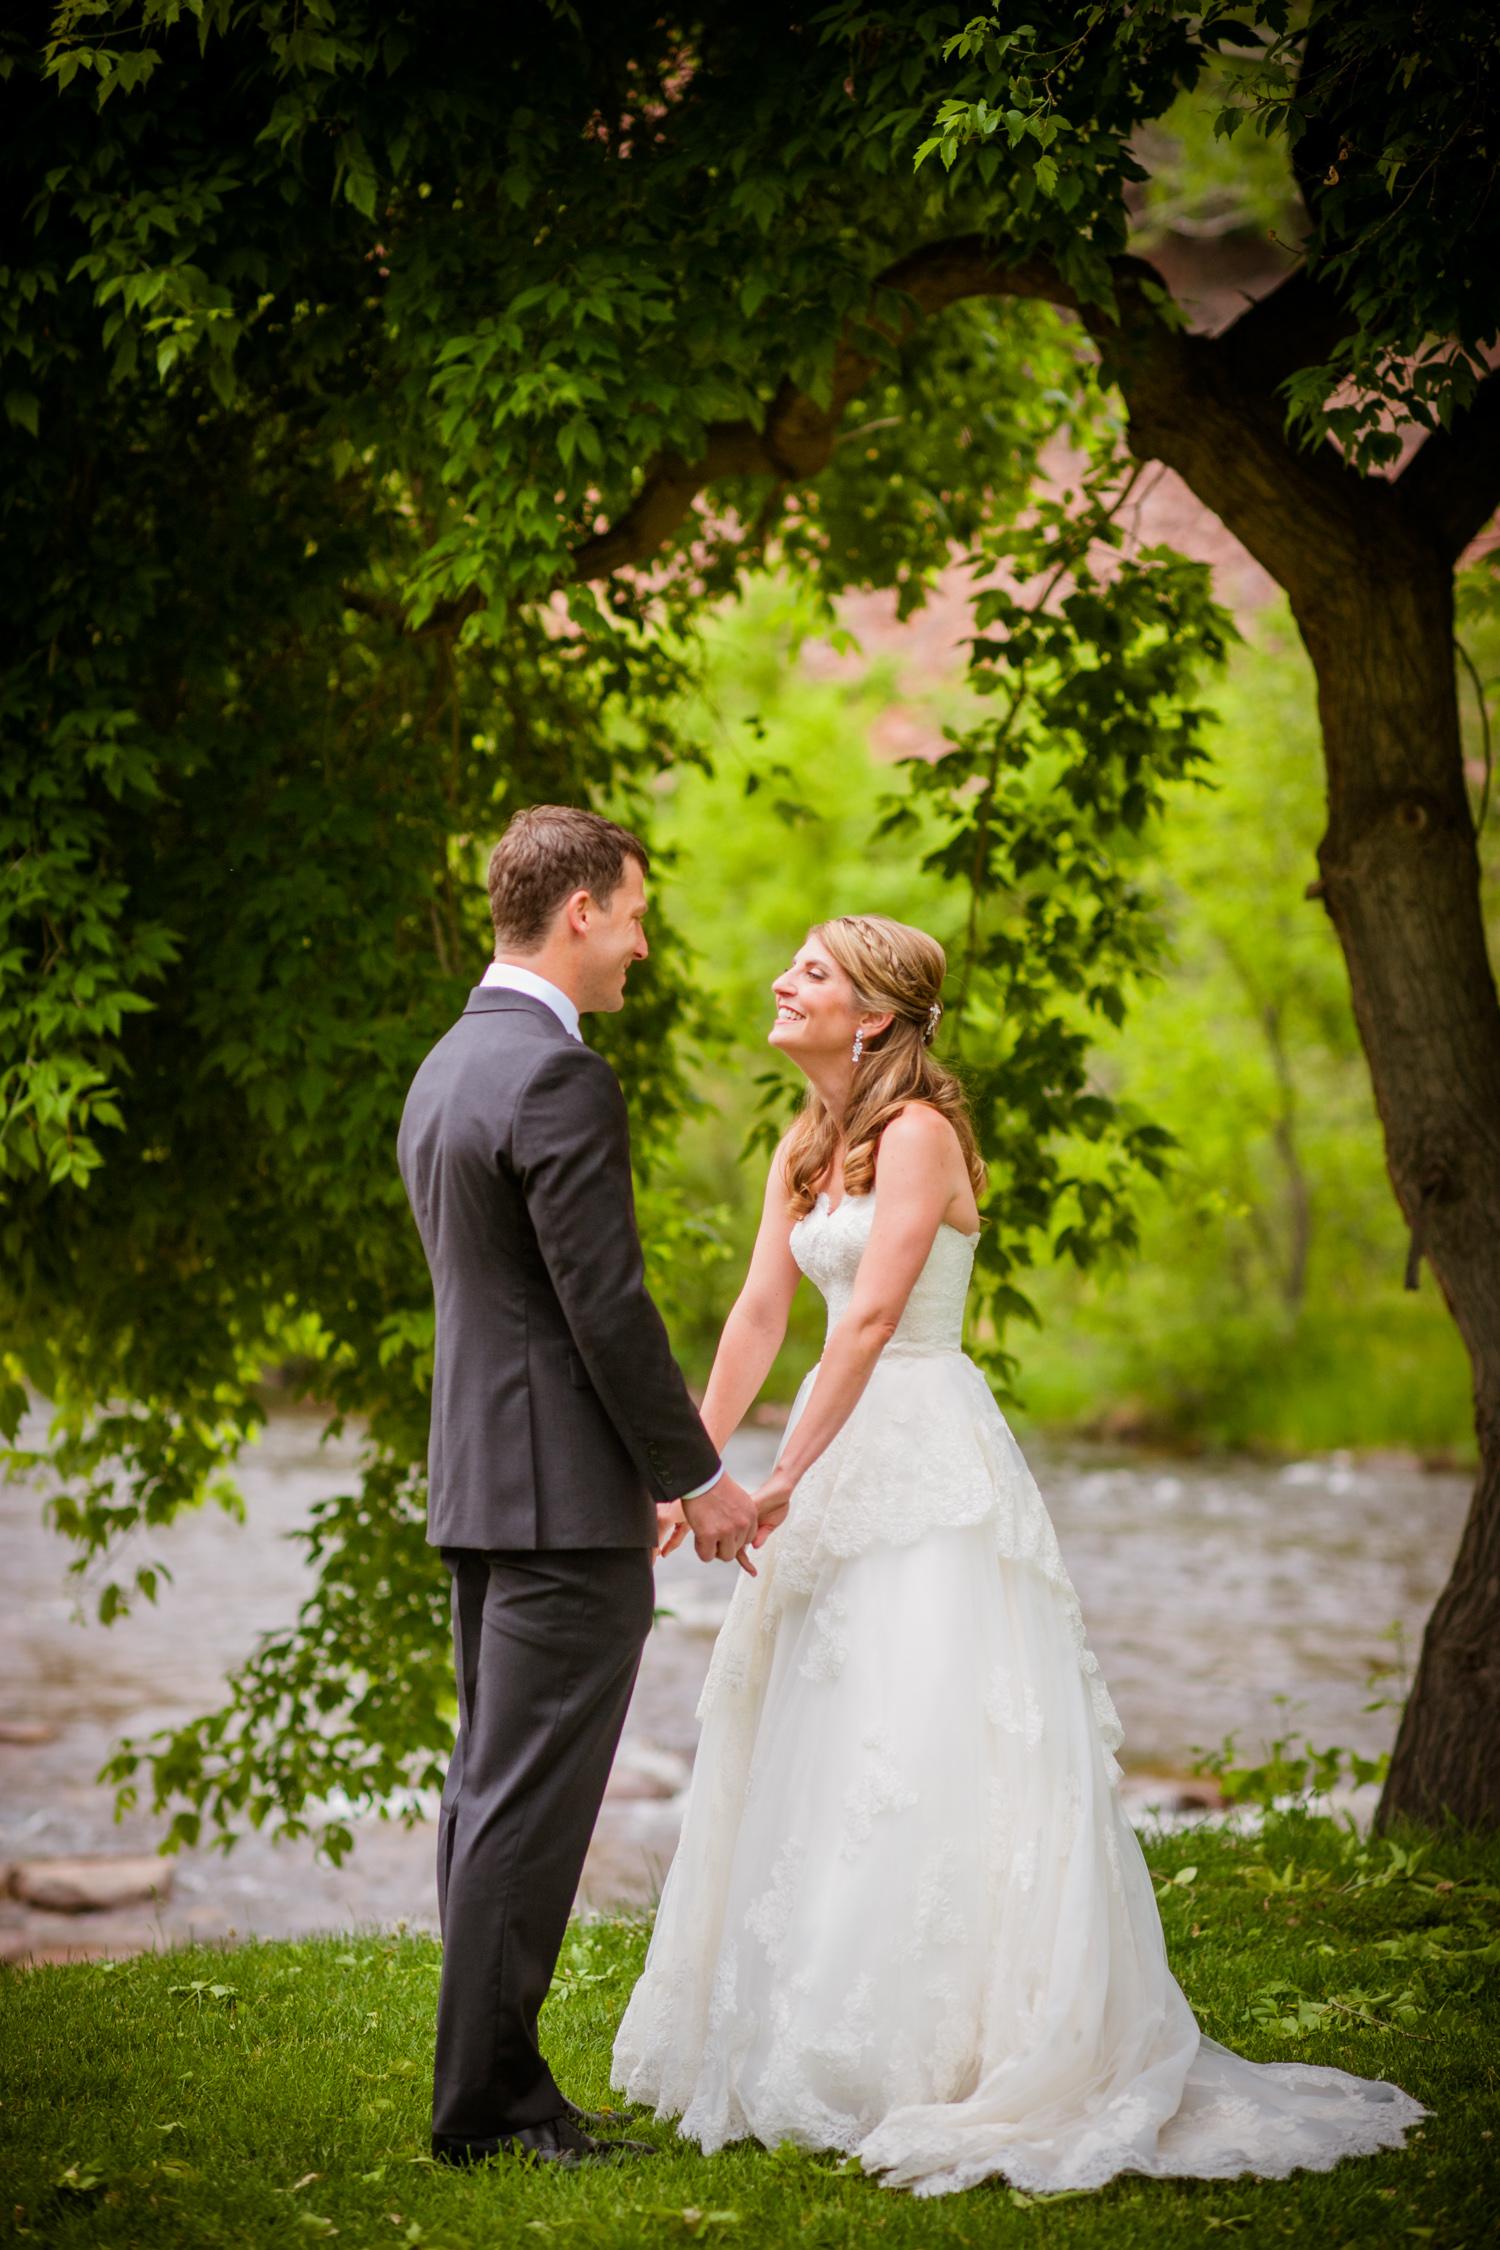 Planet_Bluegrass_Lyons_Wedding_023.JPG